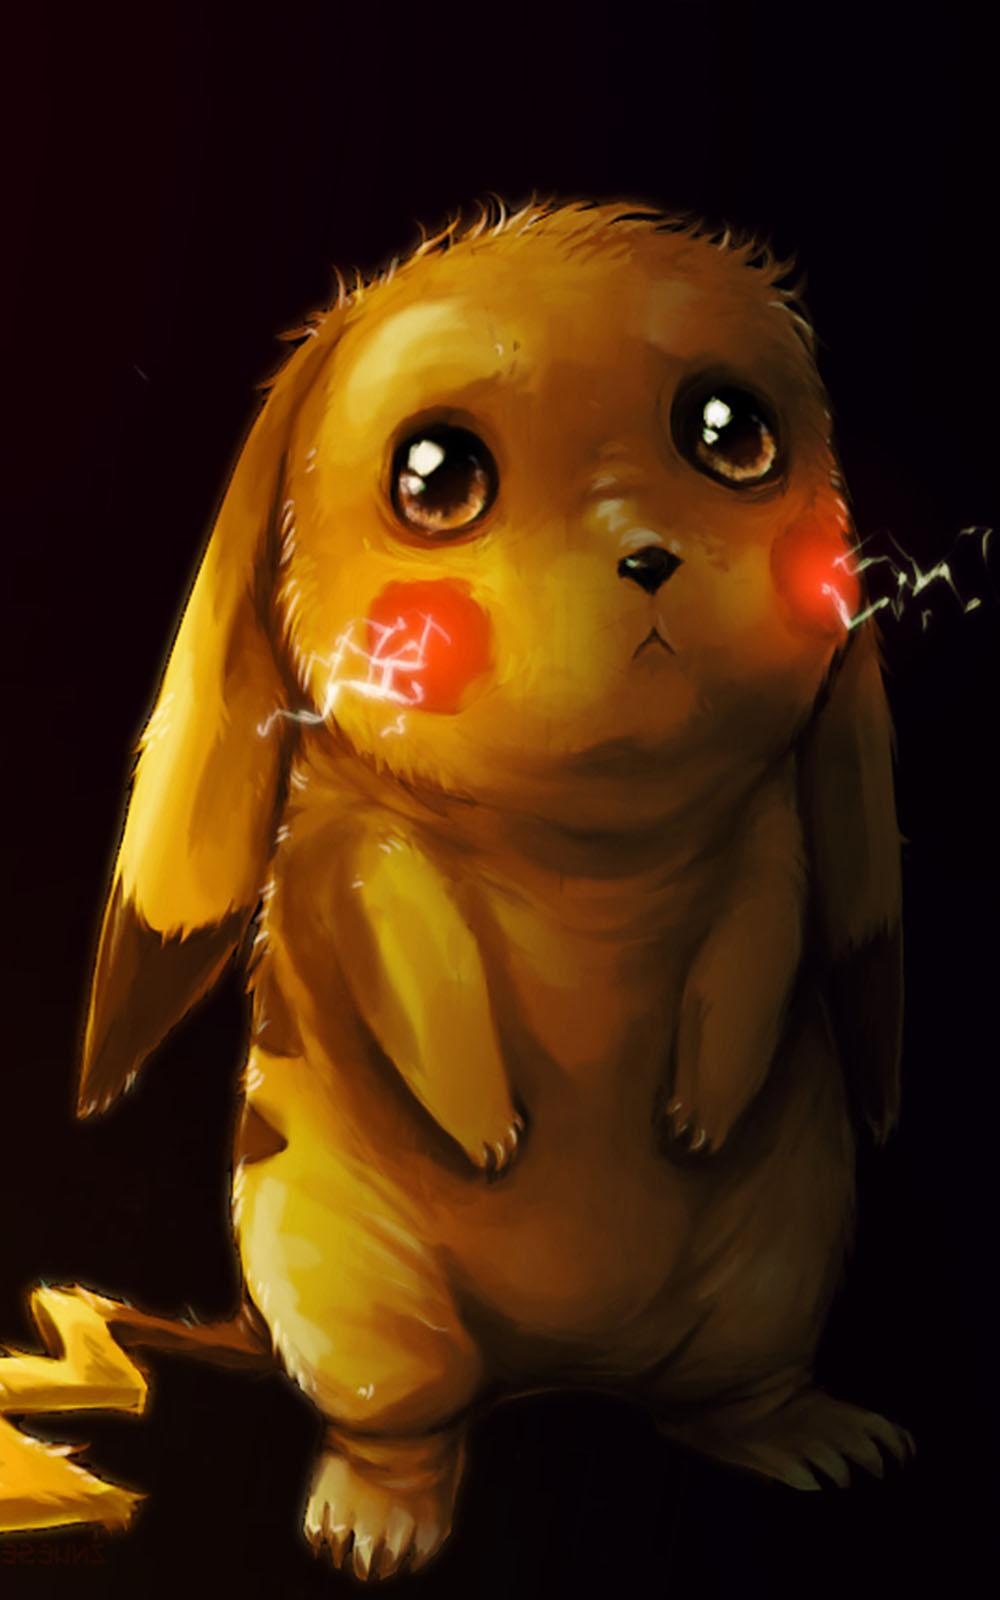 Sad Pikachu Free 4K Ultra HD Mobile Wallpaper